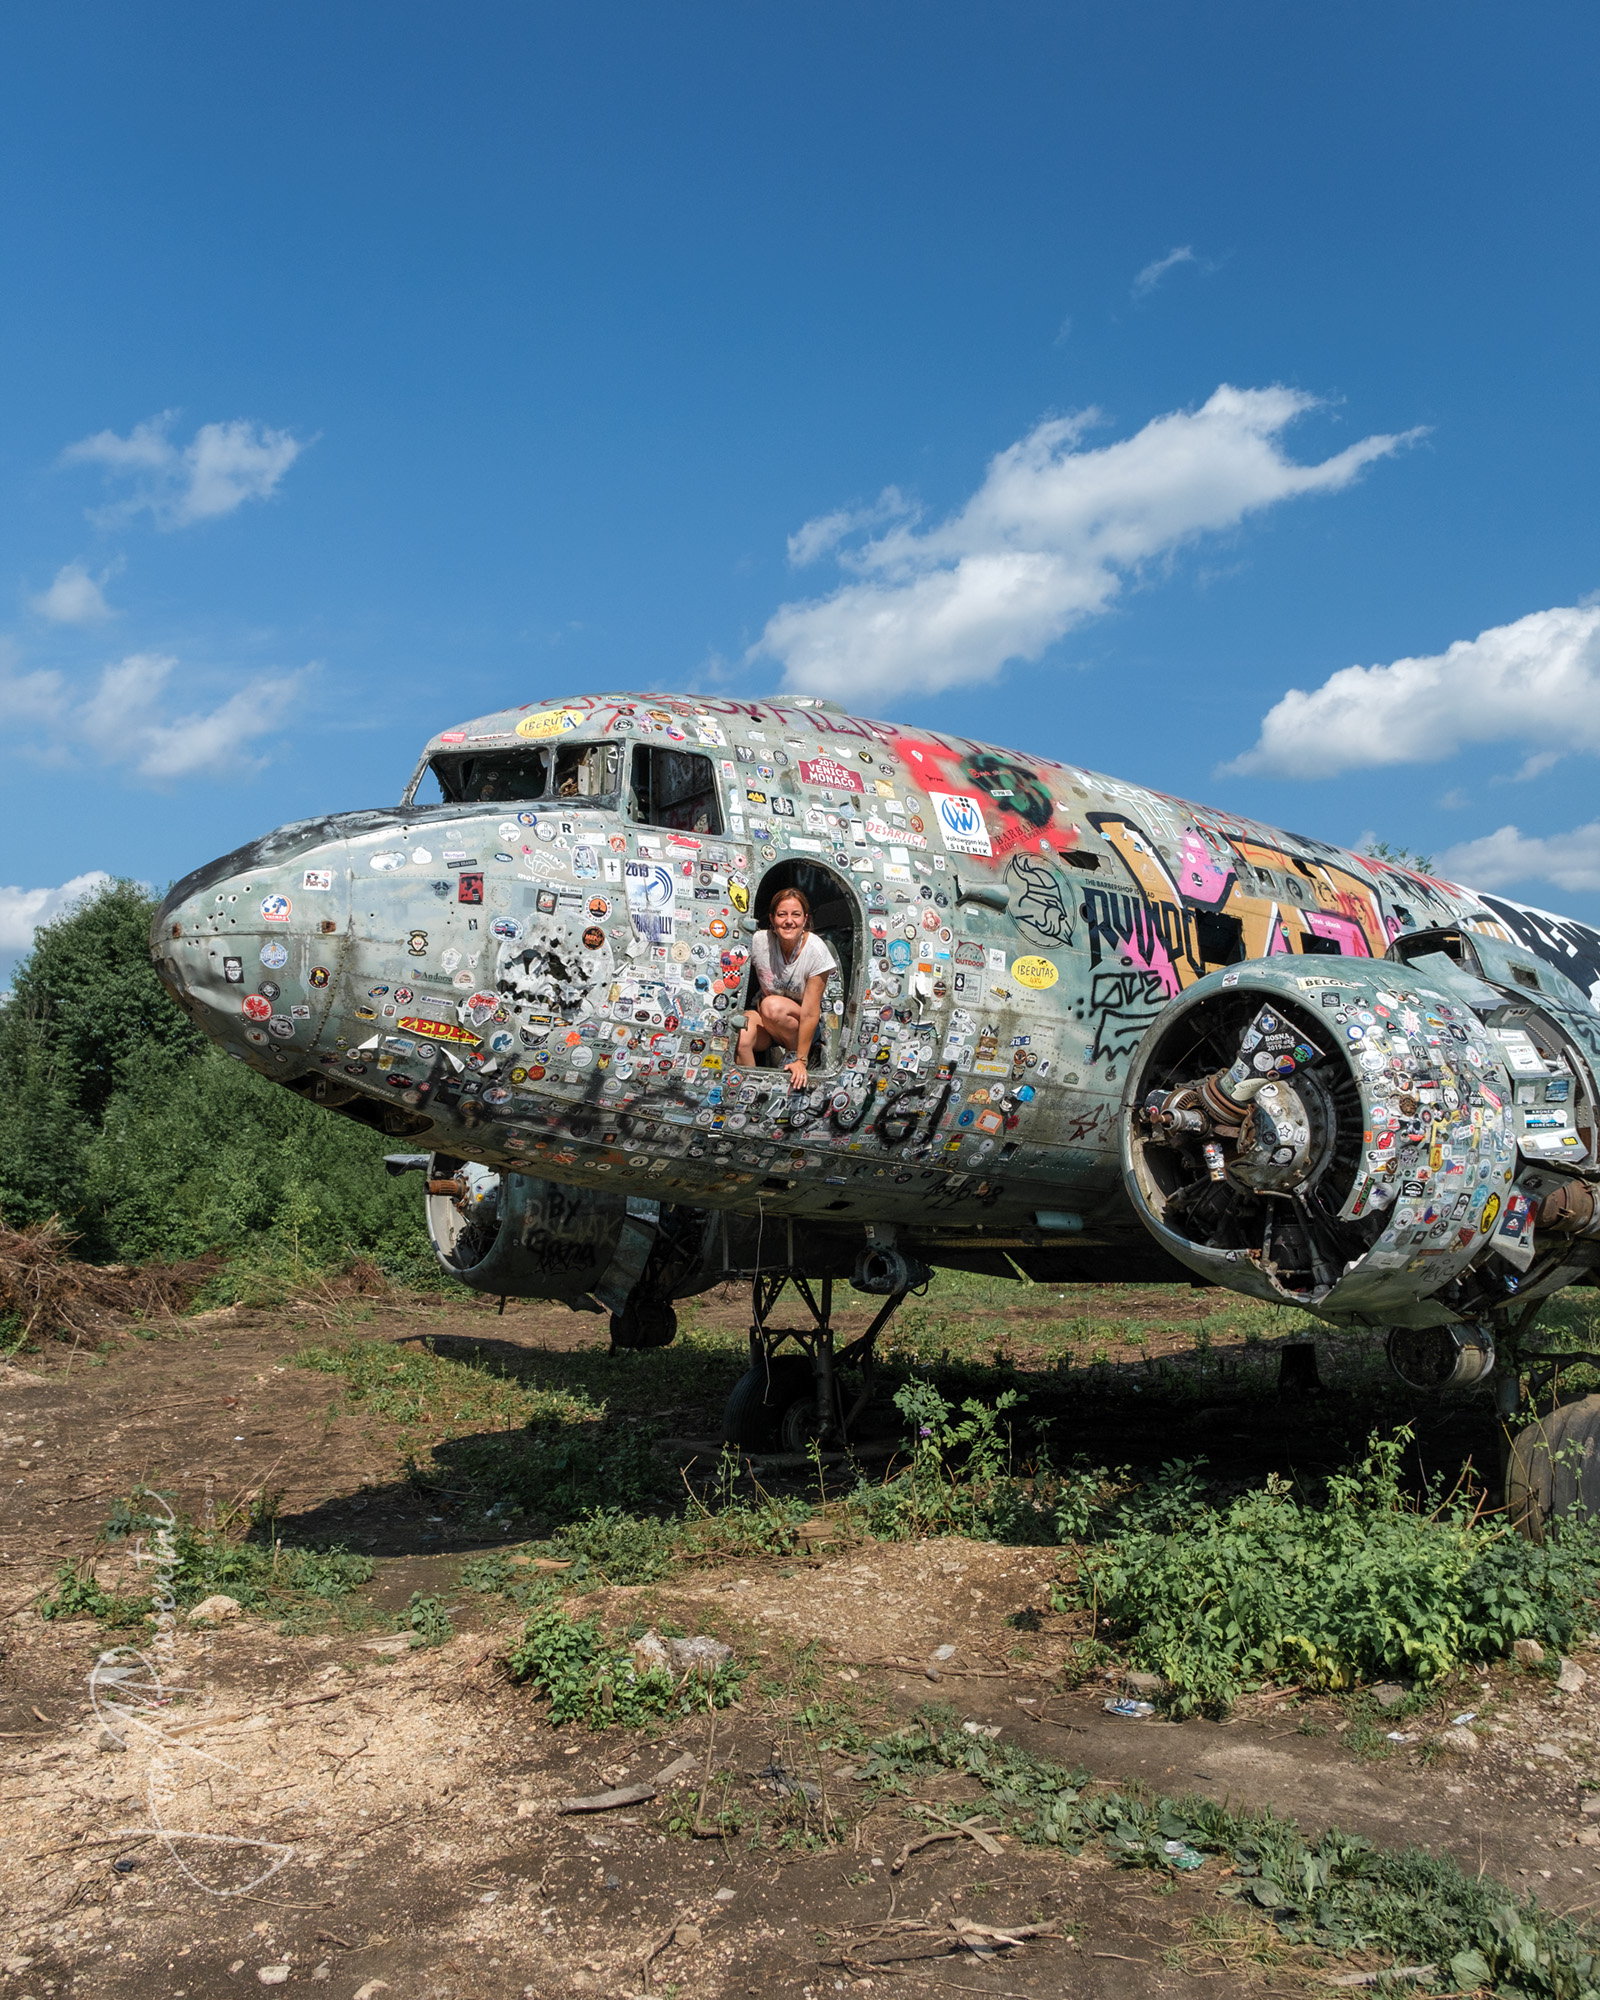 Militar base Zeljava in Croatia abandoned